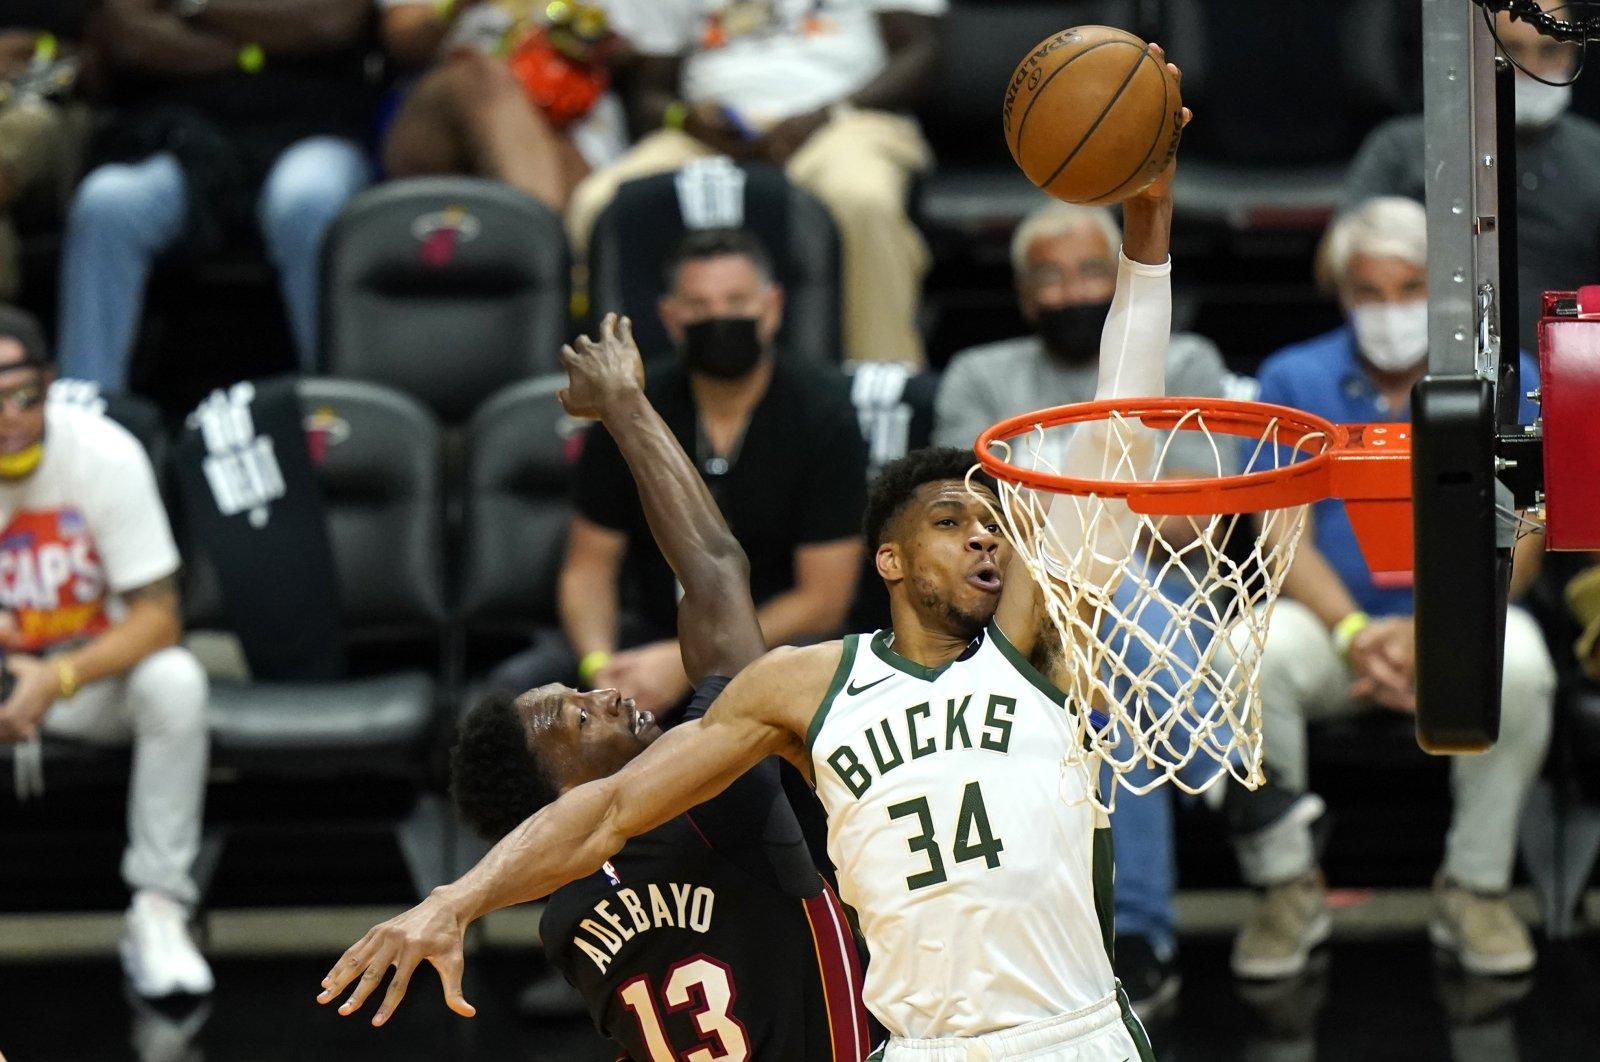 Milwaukee Bucks forward Giannis Antetokounmpo (R) shoots as Miami Heat center Bam Adebayo (L) defends during the Game 4 of NBA first-round playoff series, May 29, 2021, in Miami. (AP Photo)